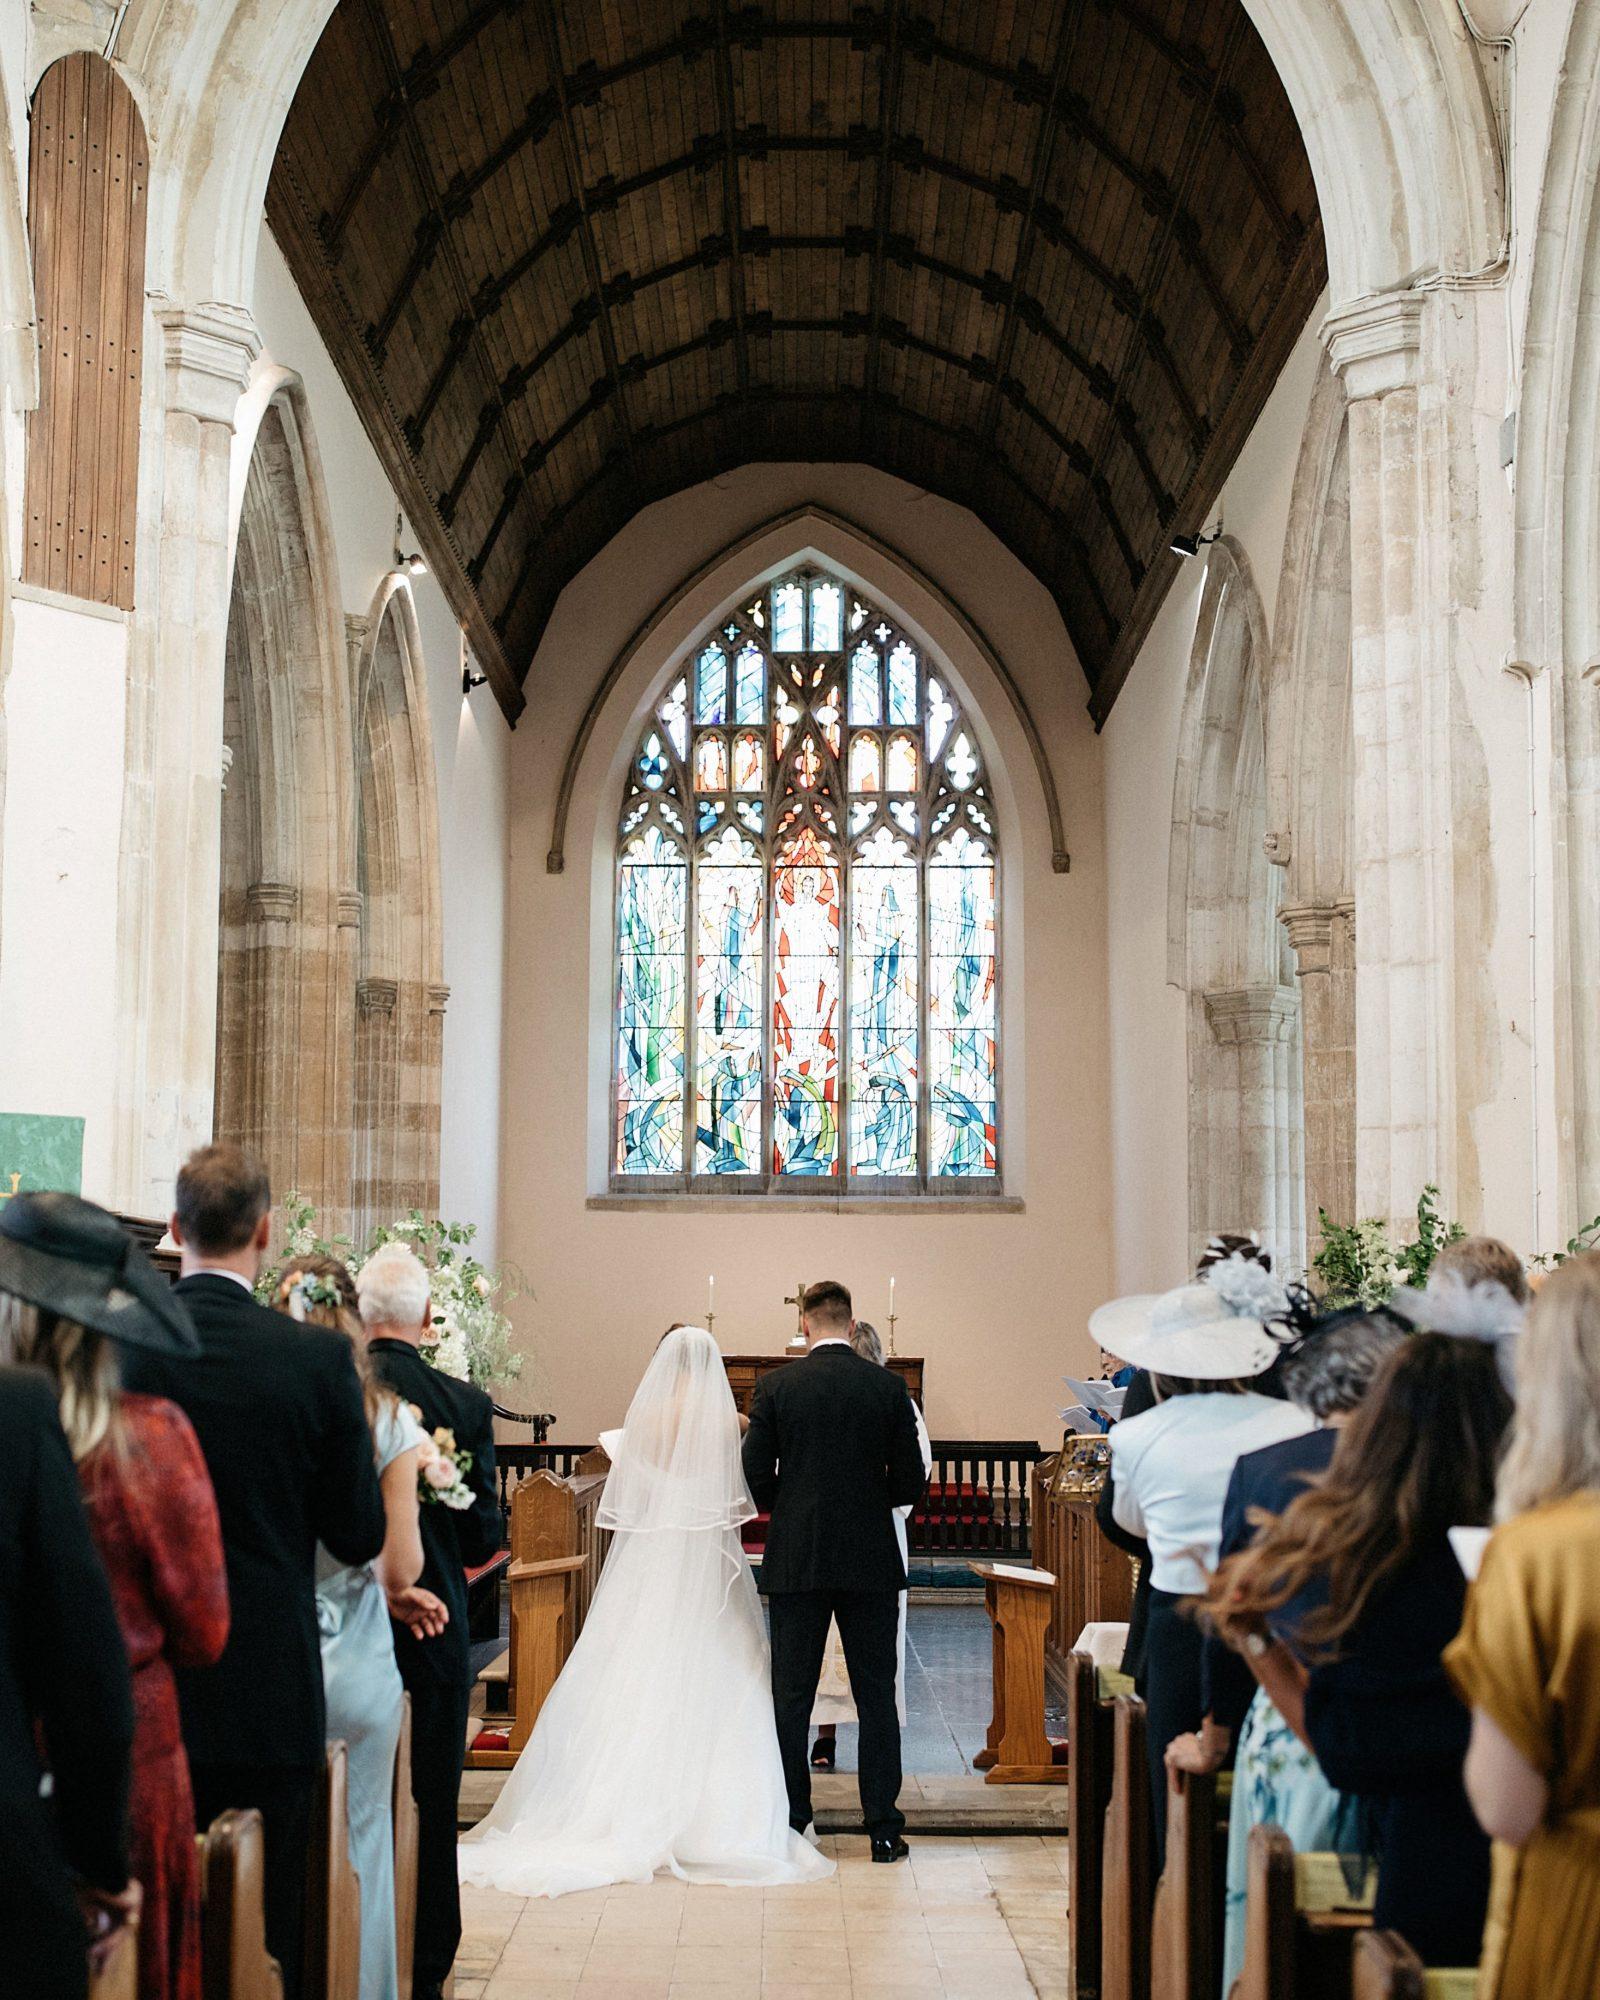 laurie lee wedding couple ceremony venue interior